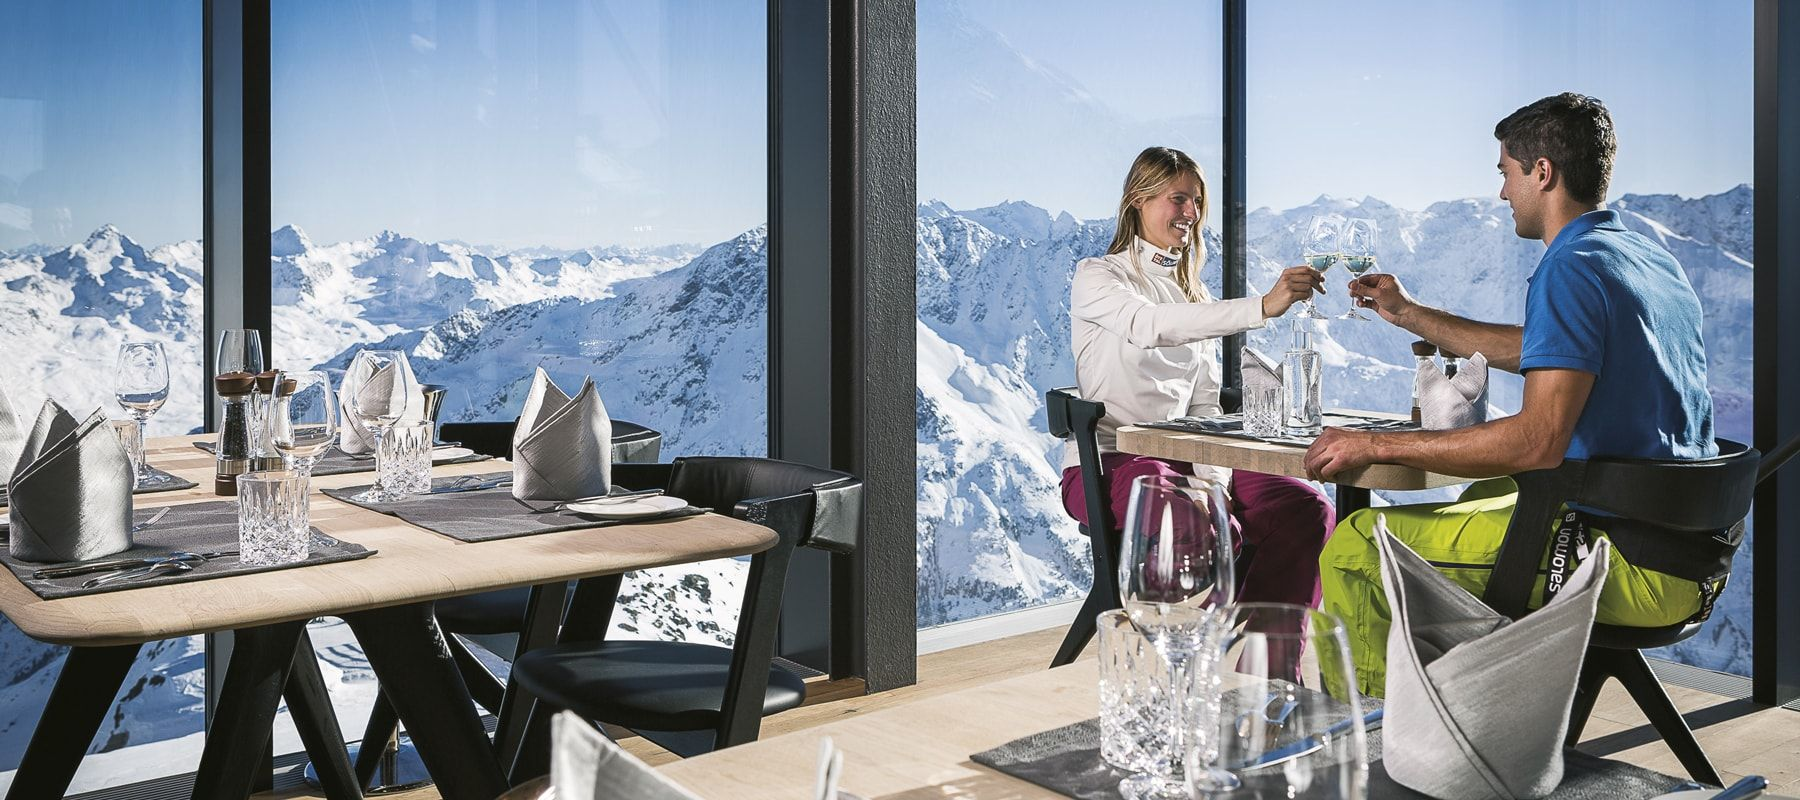 Sölden Iceq Restaurant